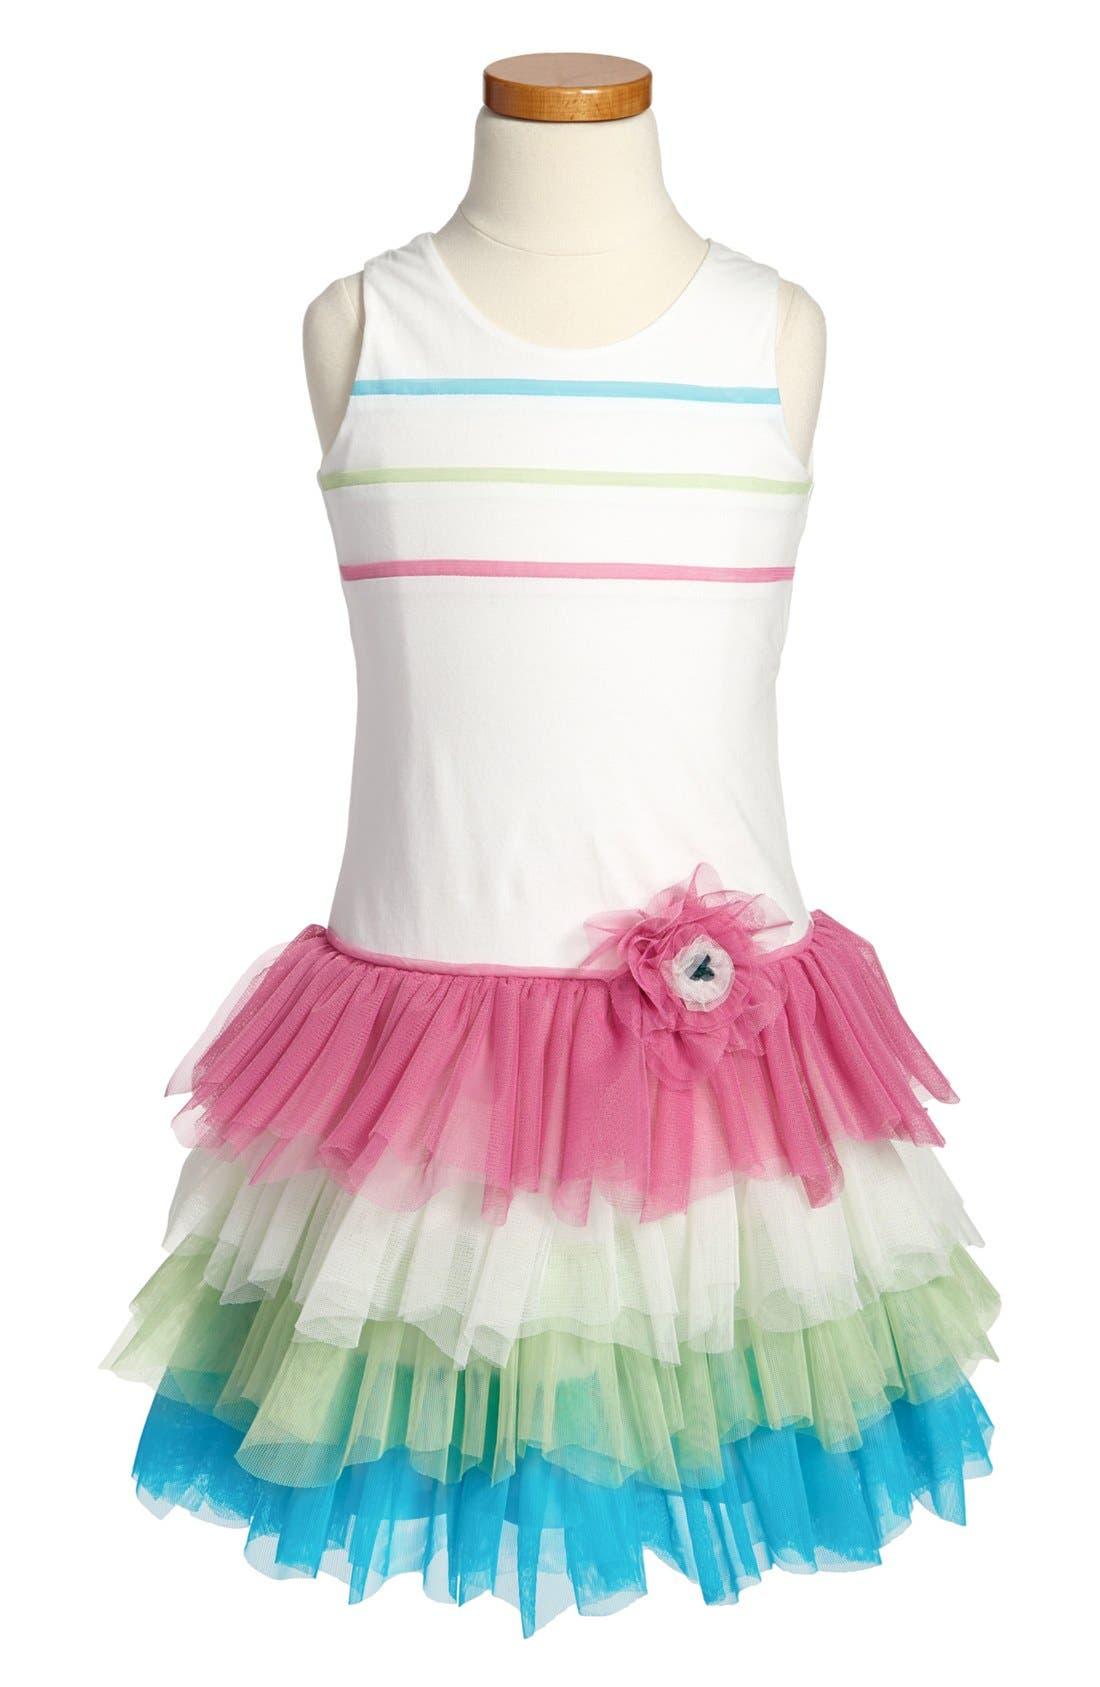 Alternate Image 1 Selected - Isobella & Chloe 'Tutti Frutti' Sleeveless Dress (Little Girls & Big Girls)